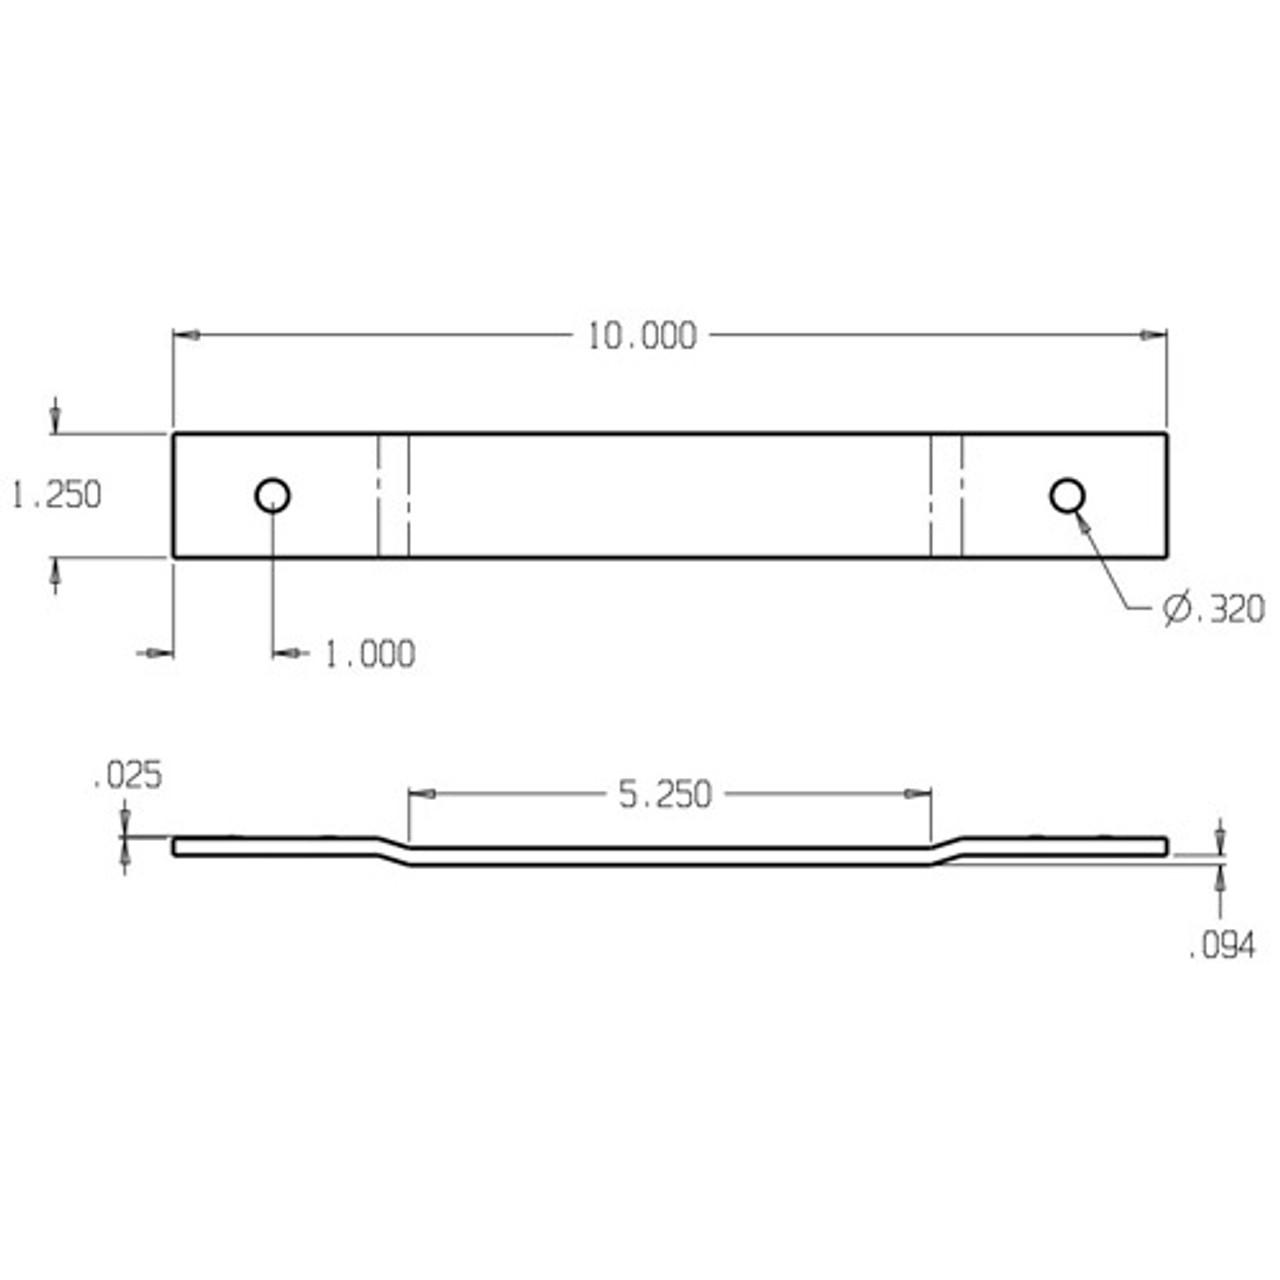 hr 200 4 1 2 don jo blank hinge reinforcement dimensional view [ 1280 x 1280 Pixel ]